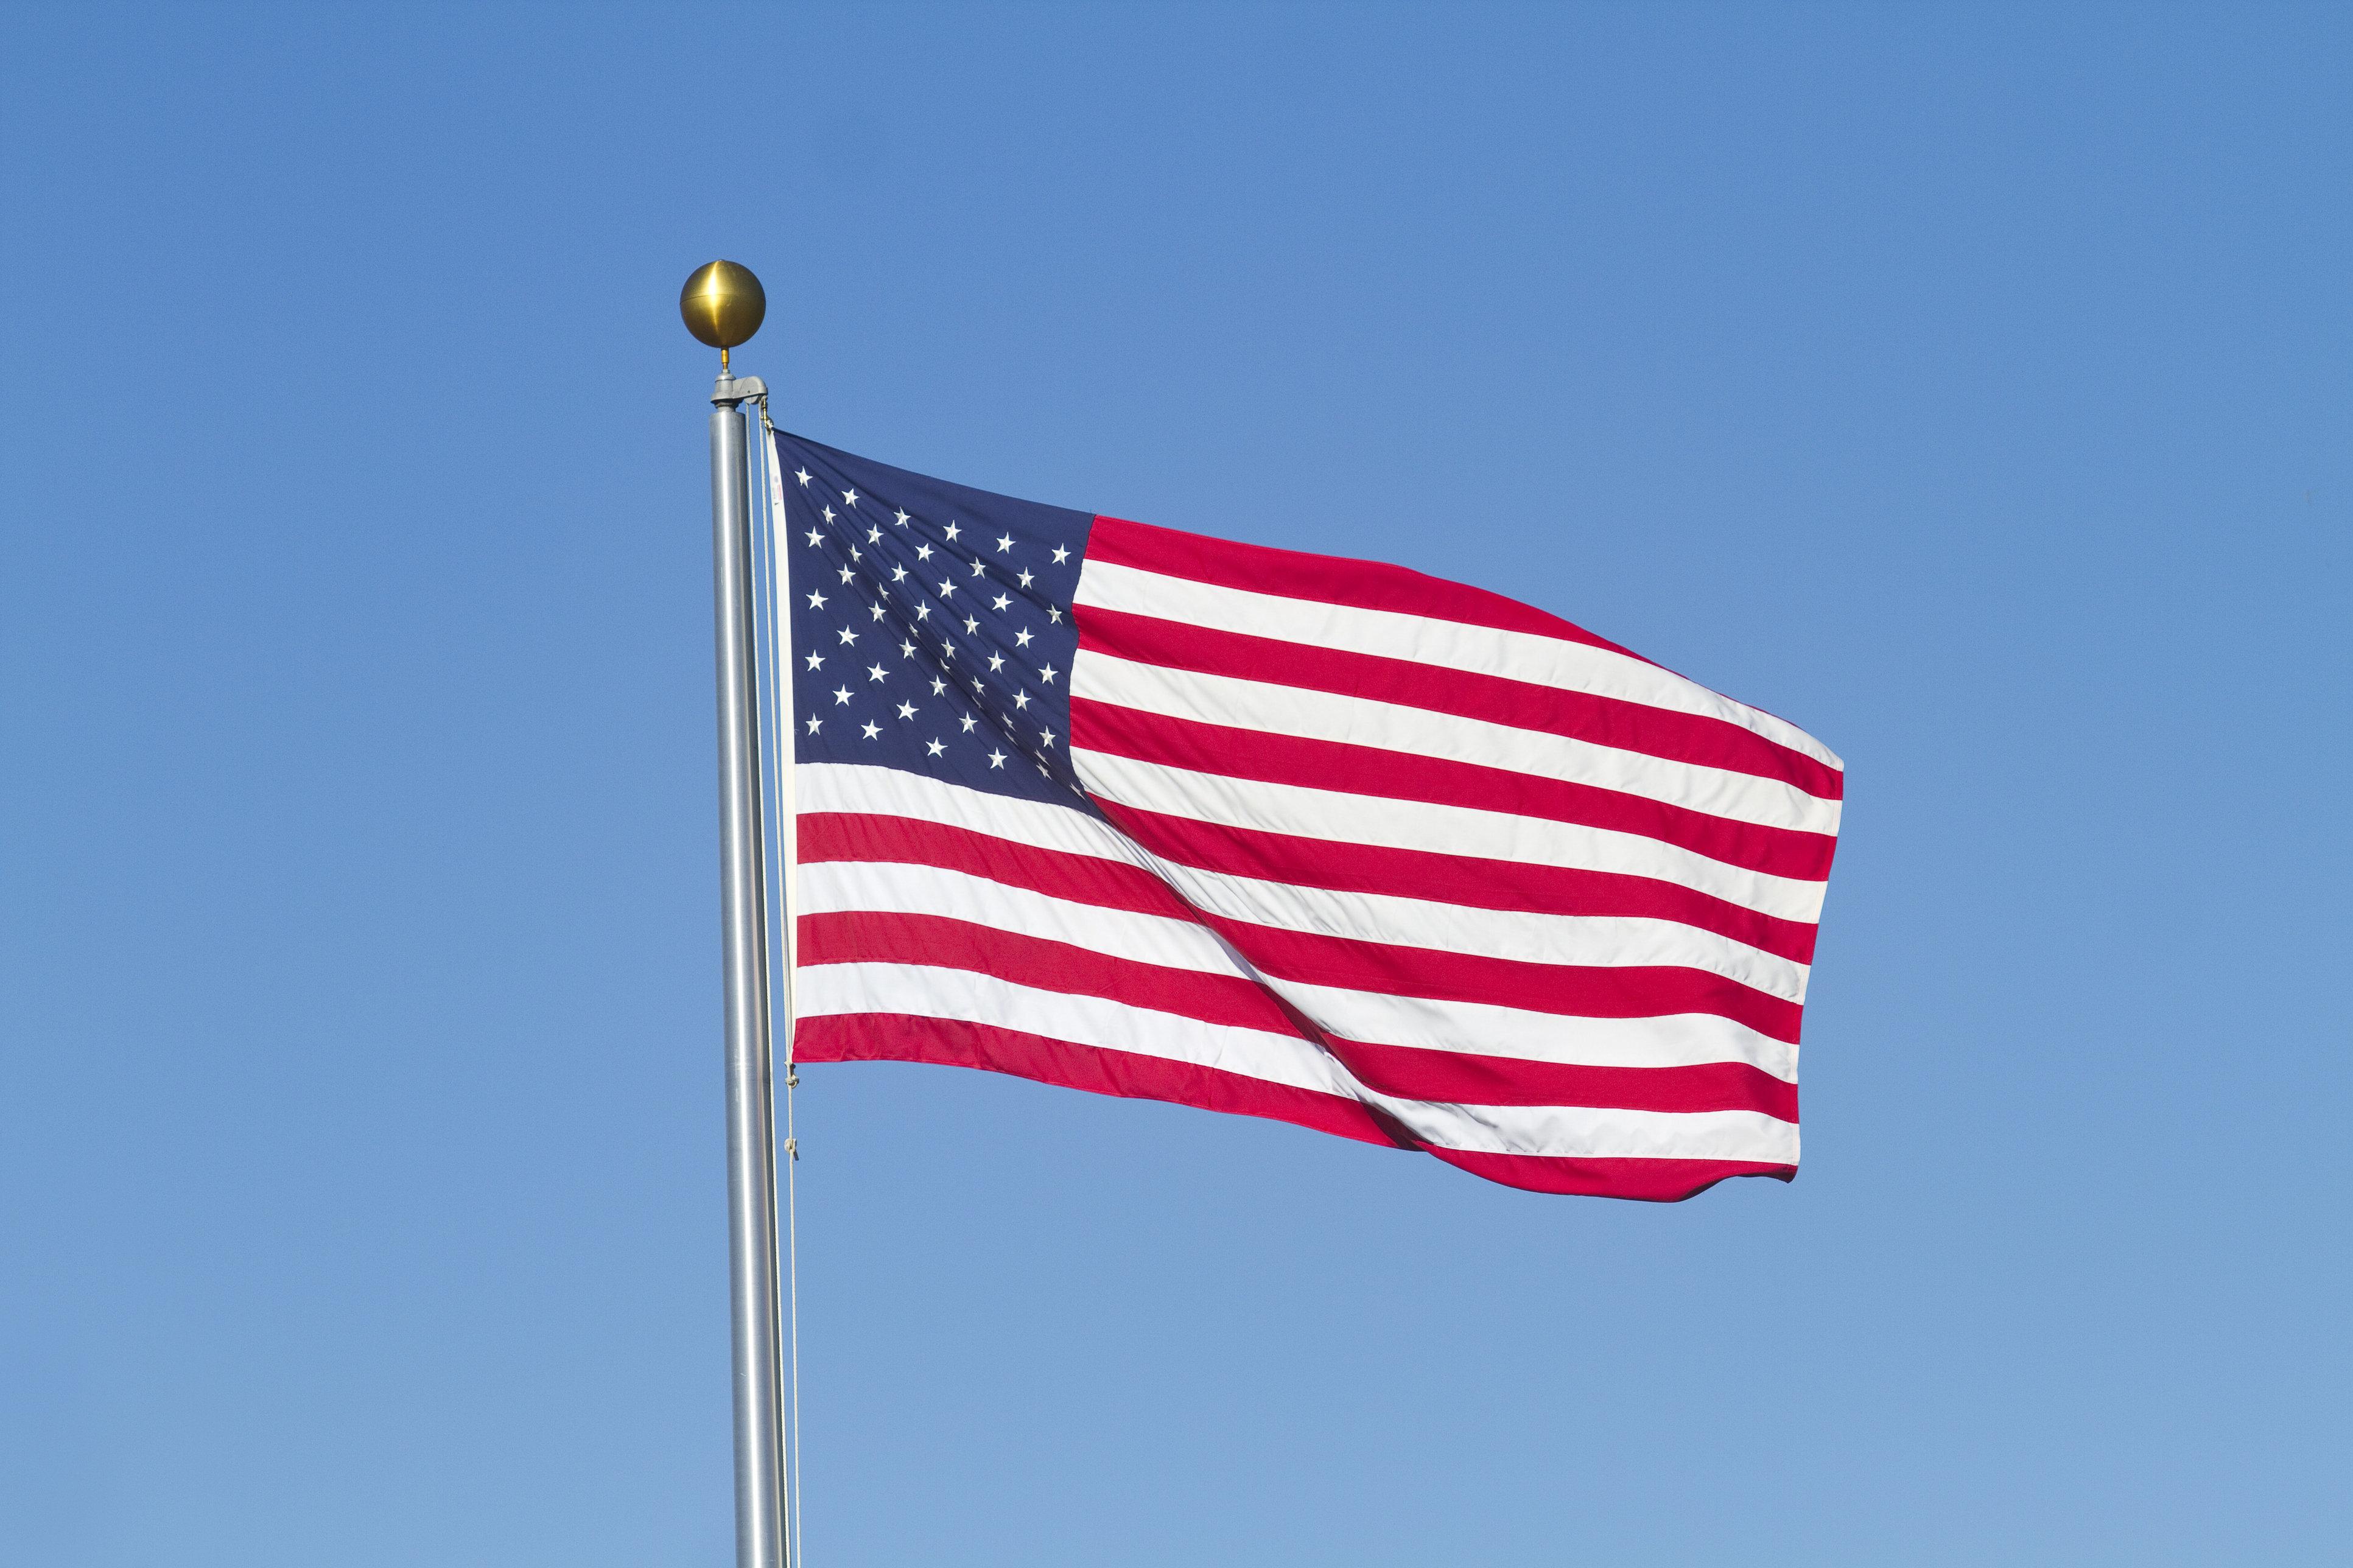 US Flag and Blue Sky